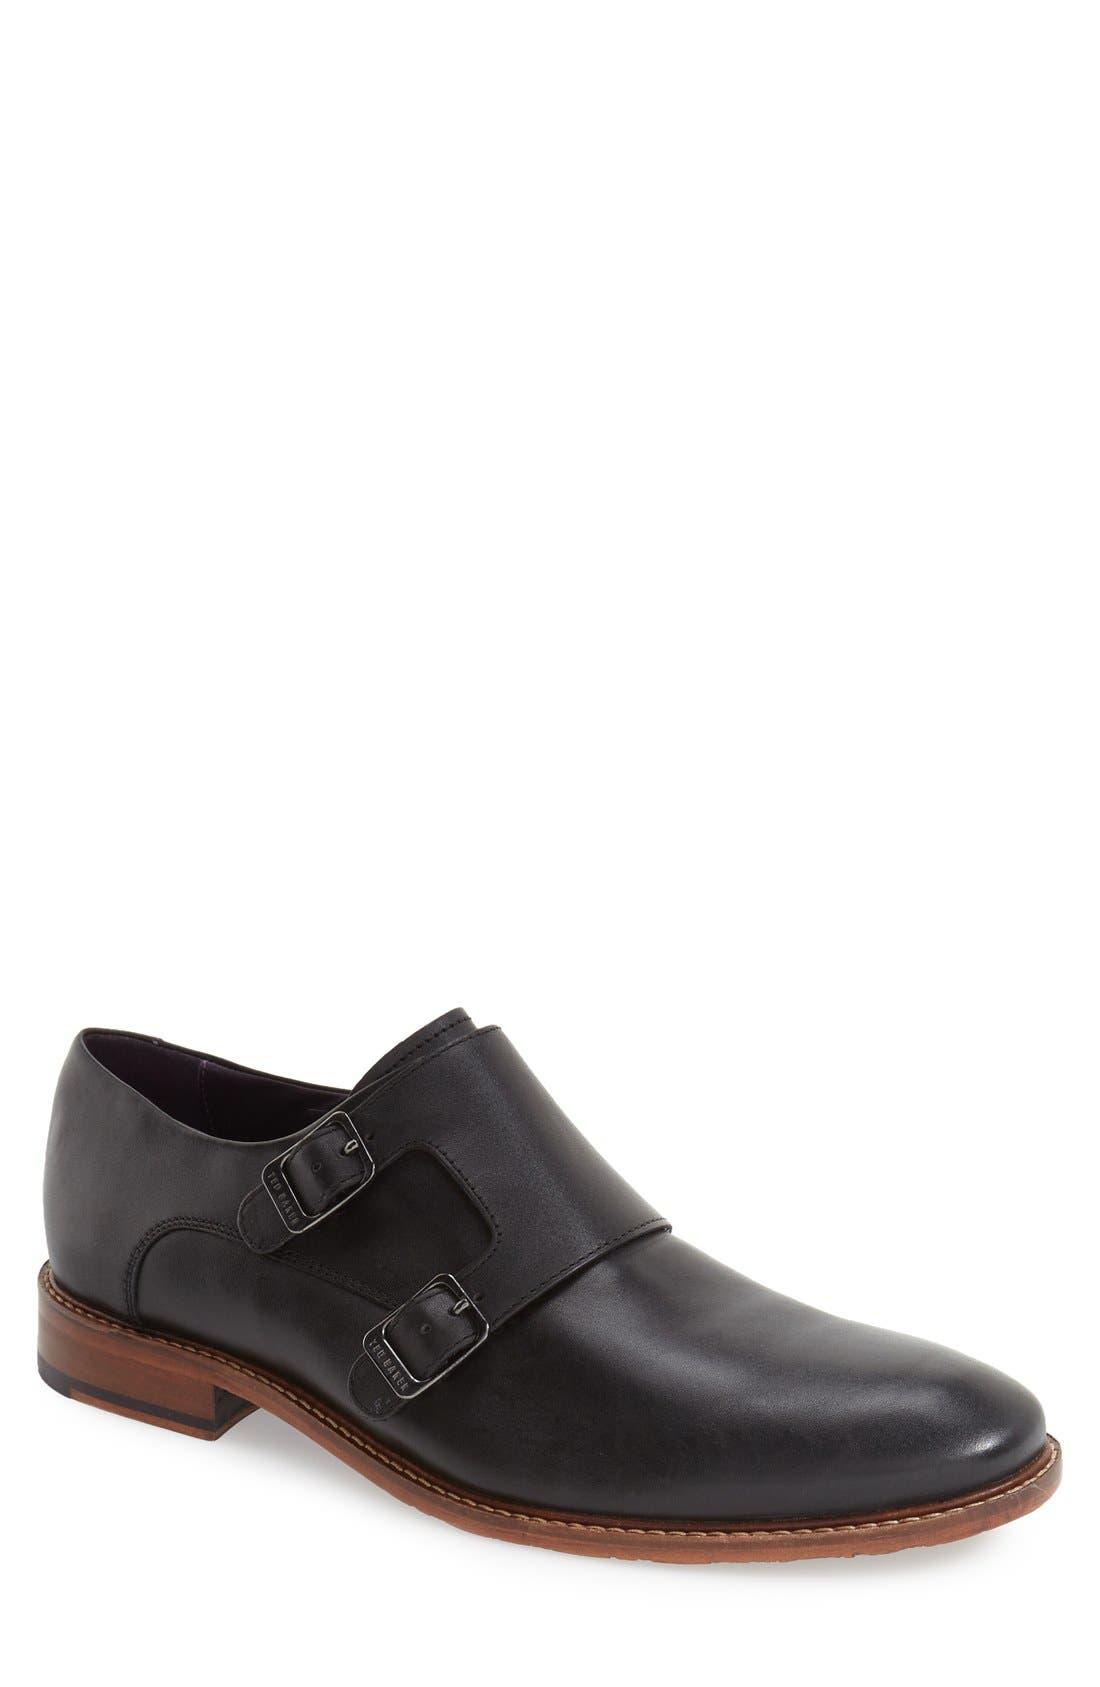 'Kartor 3' Double Monk Strap Shoe,                         Main,                         color, 001